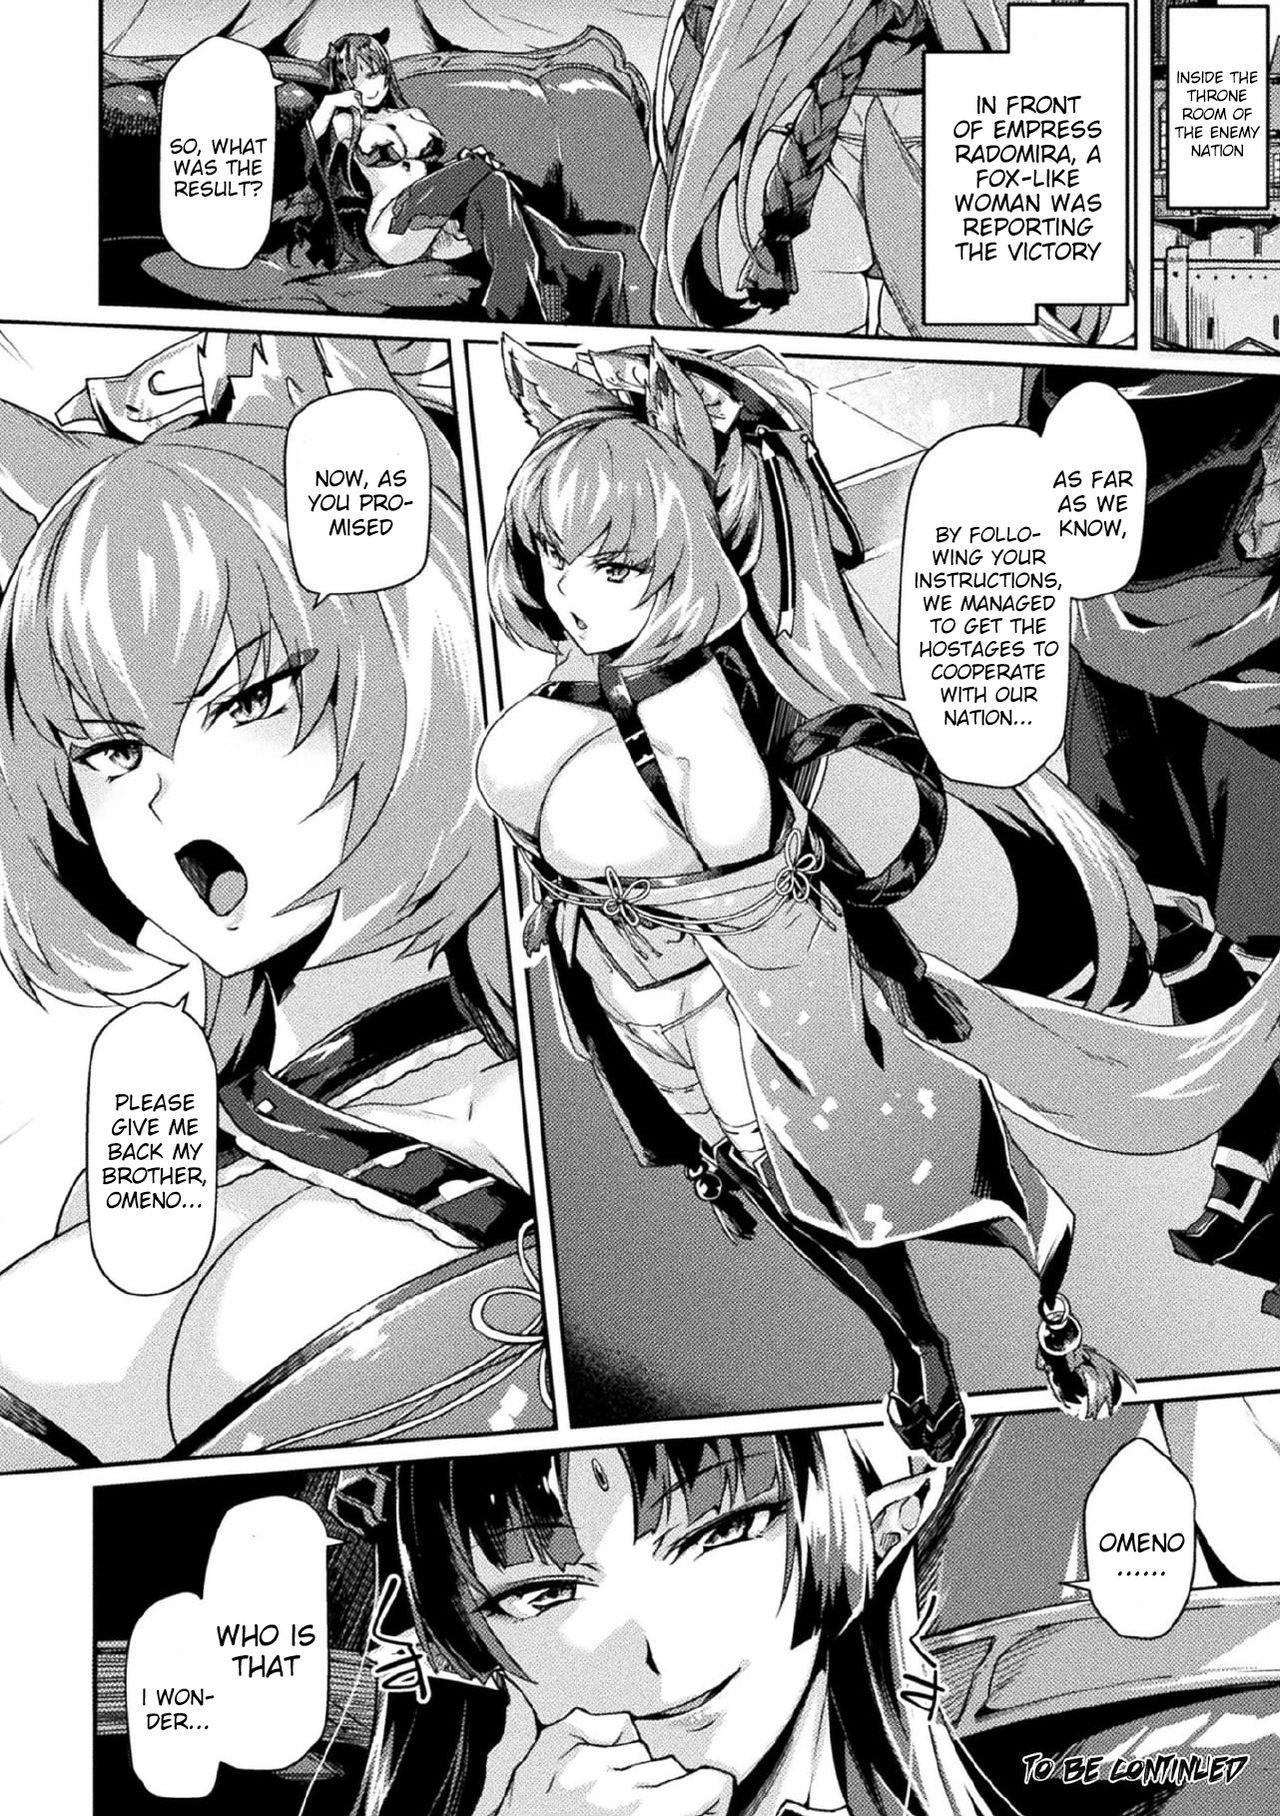 [Tsukitokage] Kuroinu II ~Inyoku ni Somaru Haitoku no Miyako, Futatabi~ THE COMIC Ch. 4 (Kukkoro Heroines Vol. 3) [Digital] [English] [Decensored] (Klub Kemoner, Raknnkarscans) 21